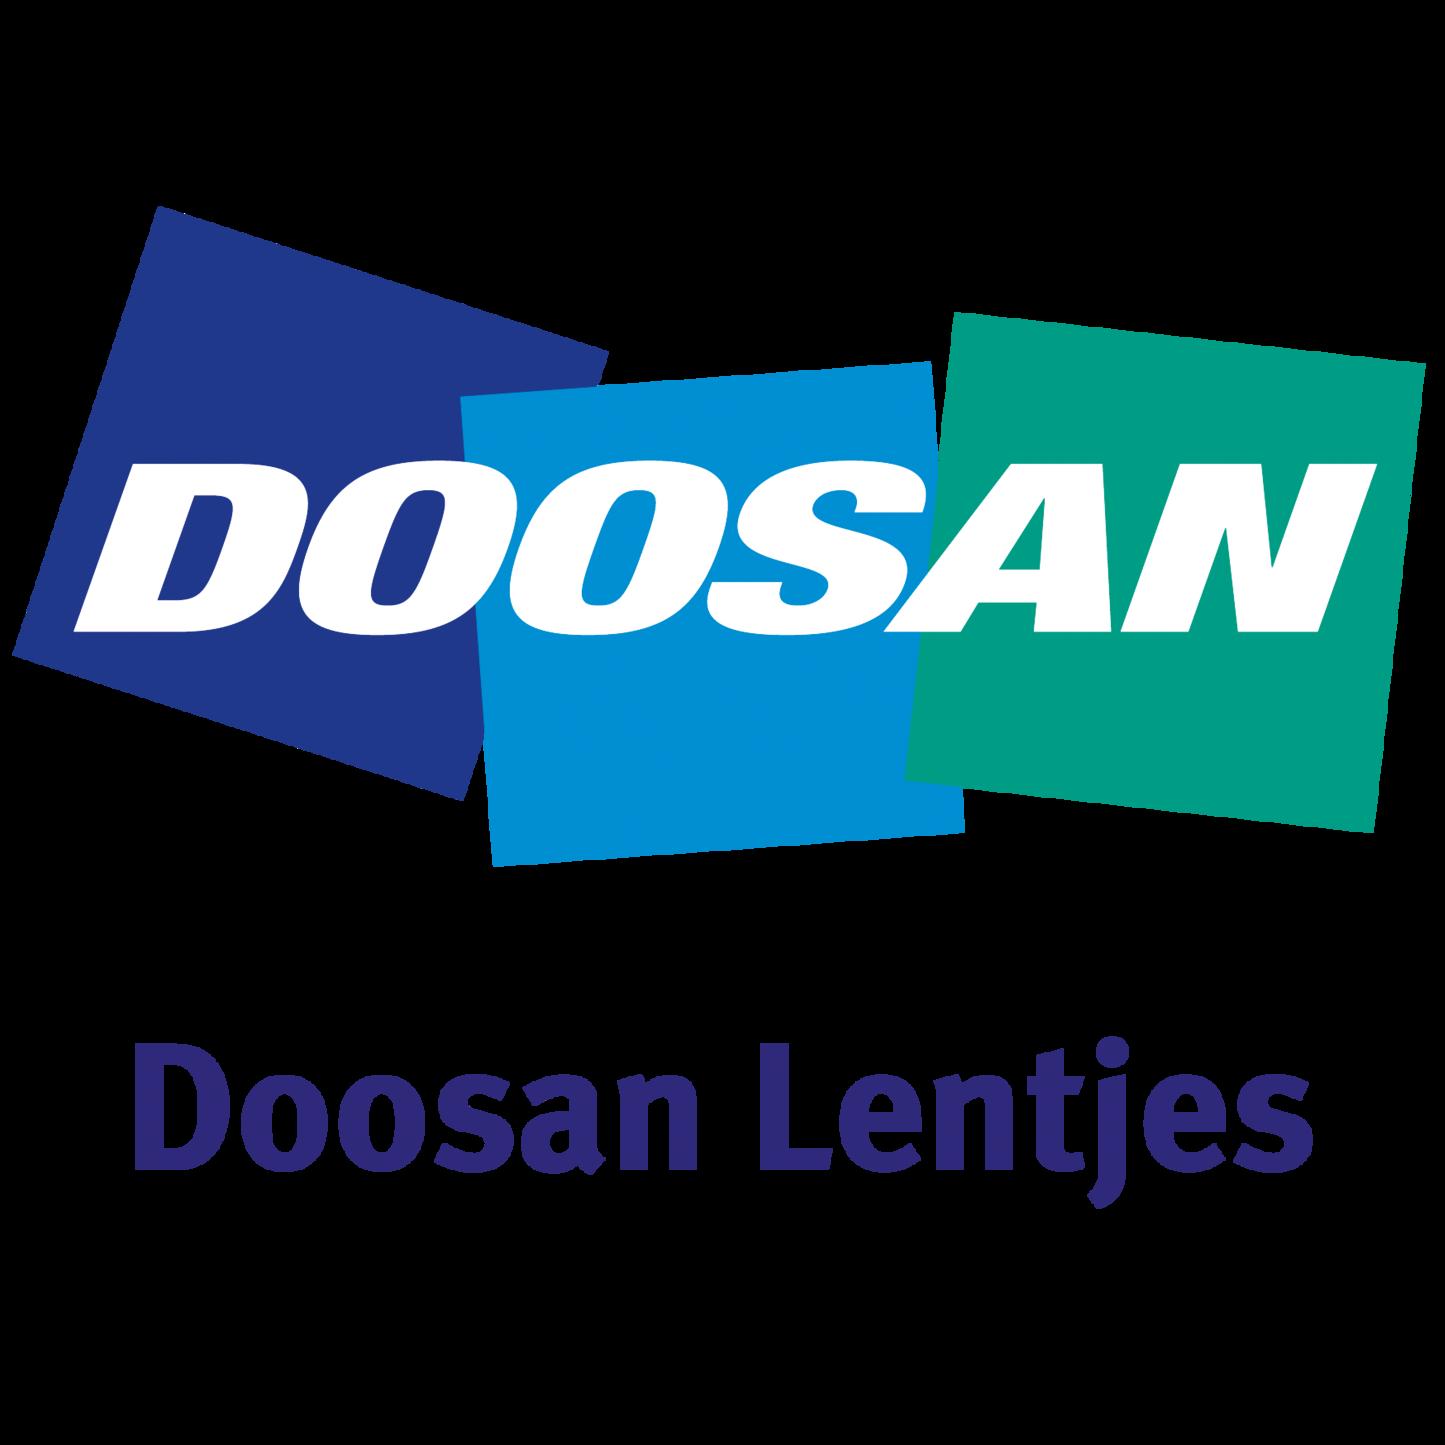 Company logo of Doosan Lentjes GmbH